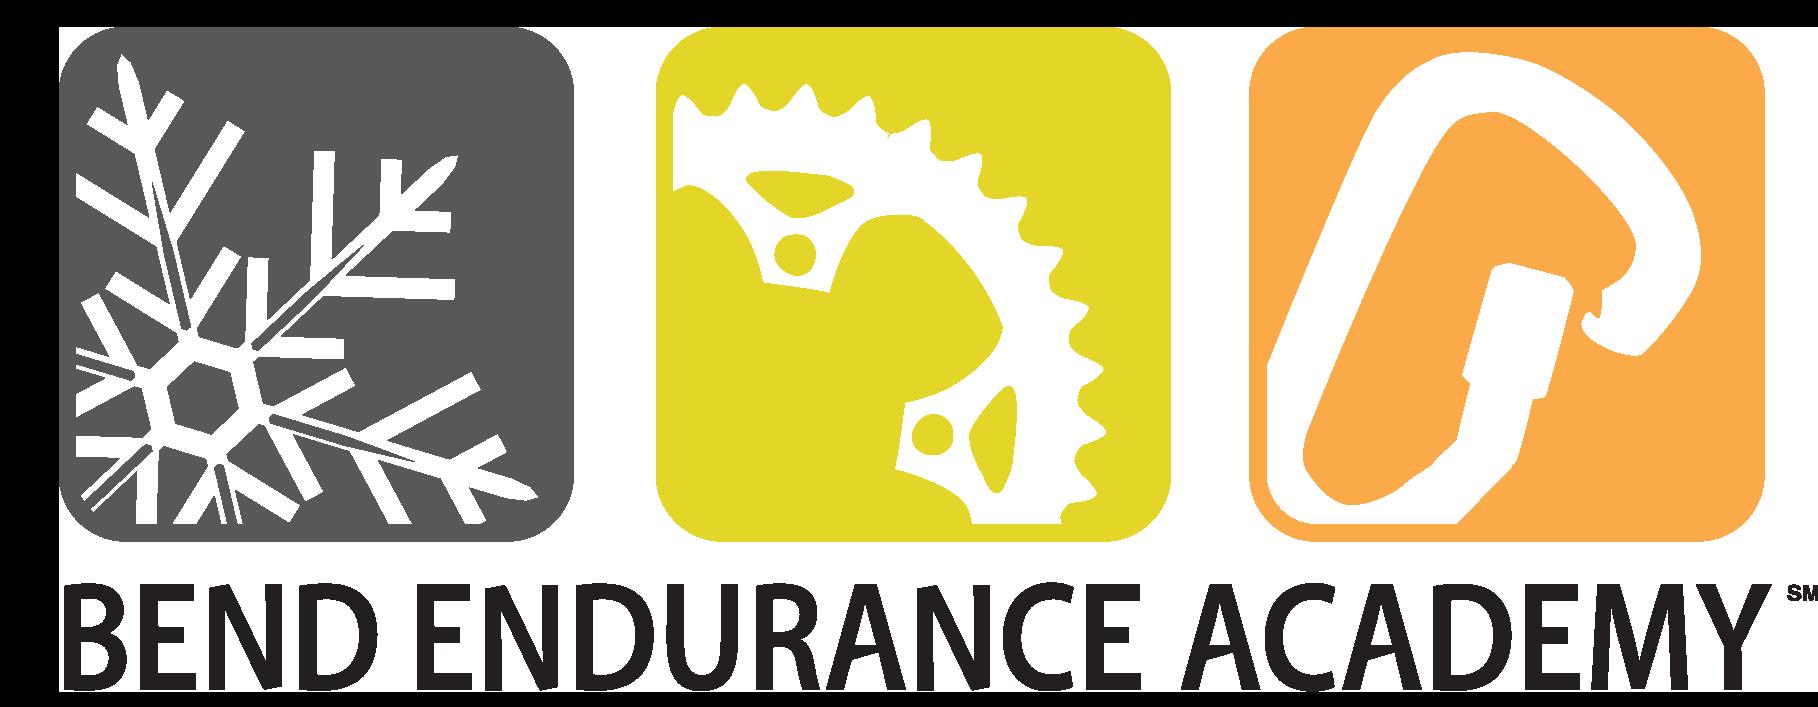 Bend-Endurance-Academy-logo-red-button-trans